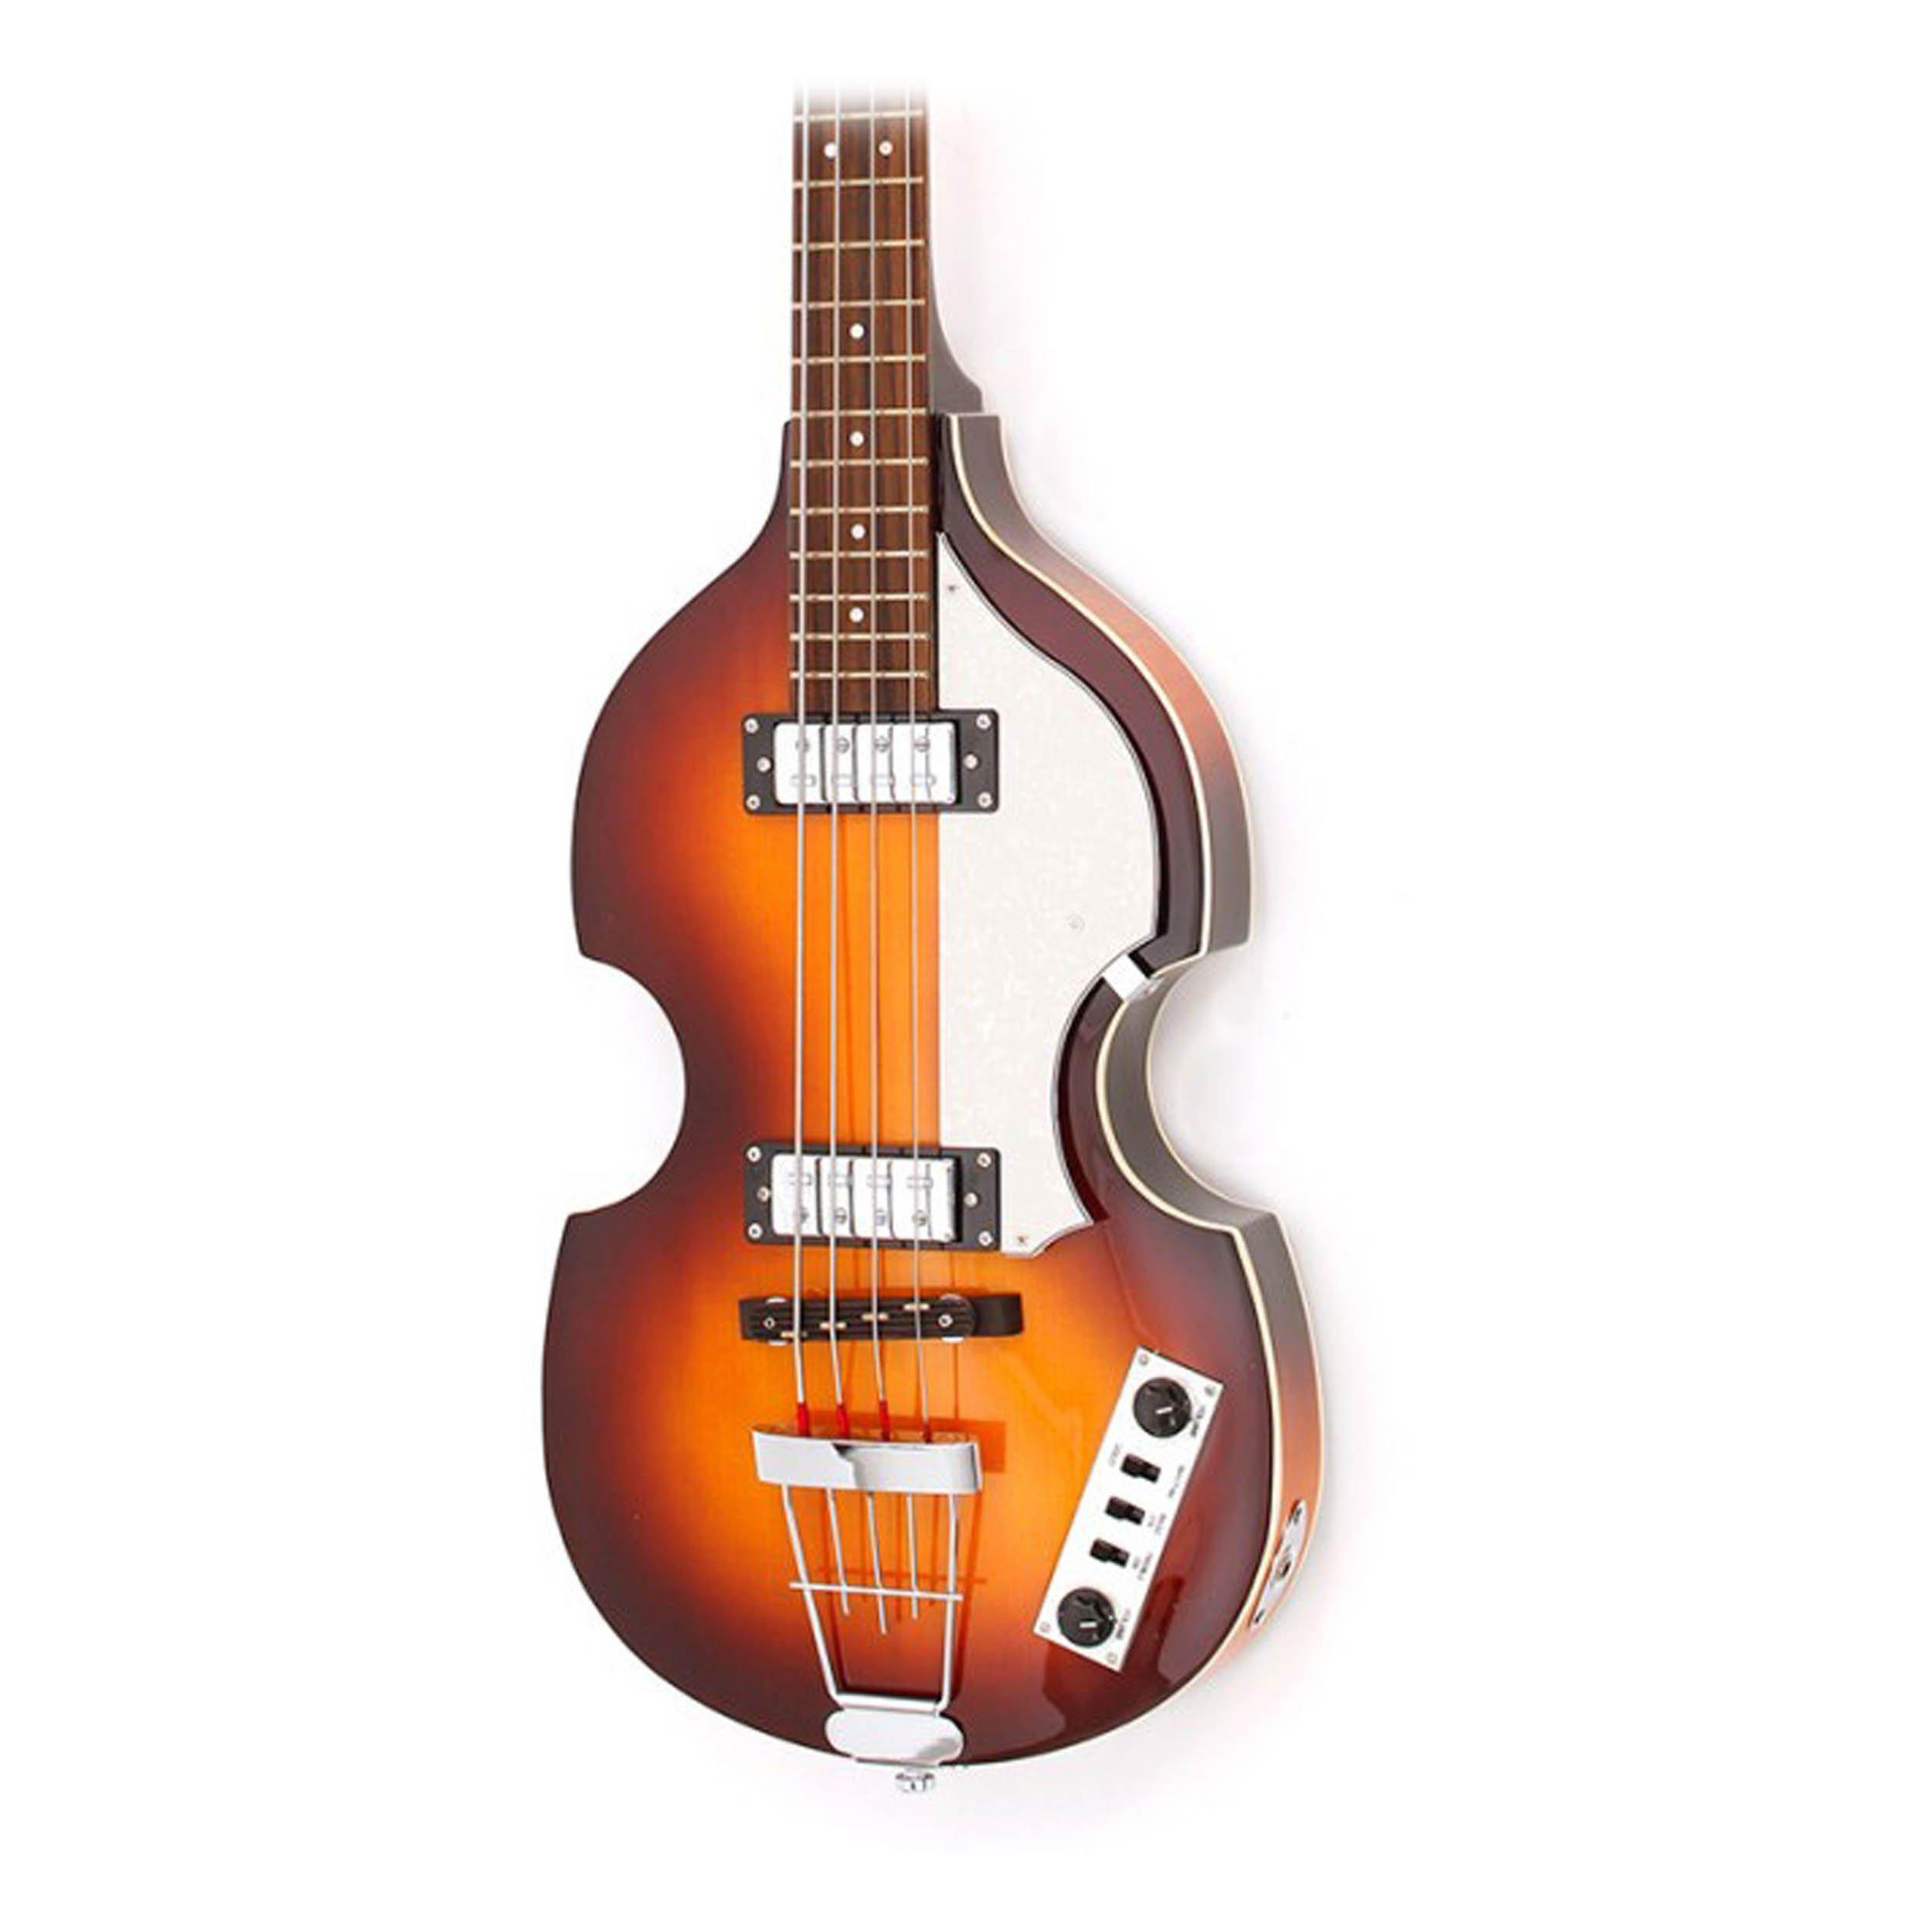 Hofner HOF-HI-BB-SB-O 4-String Bass Guitar